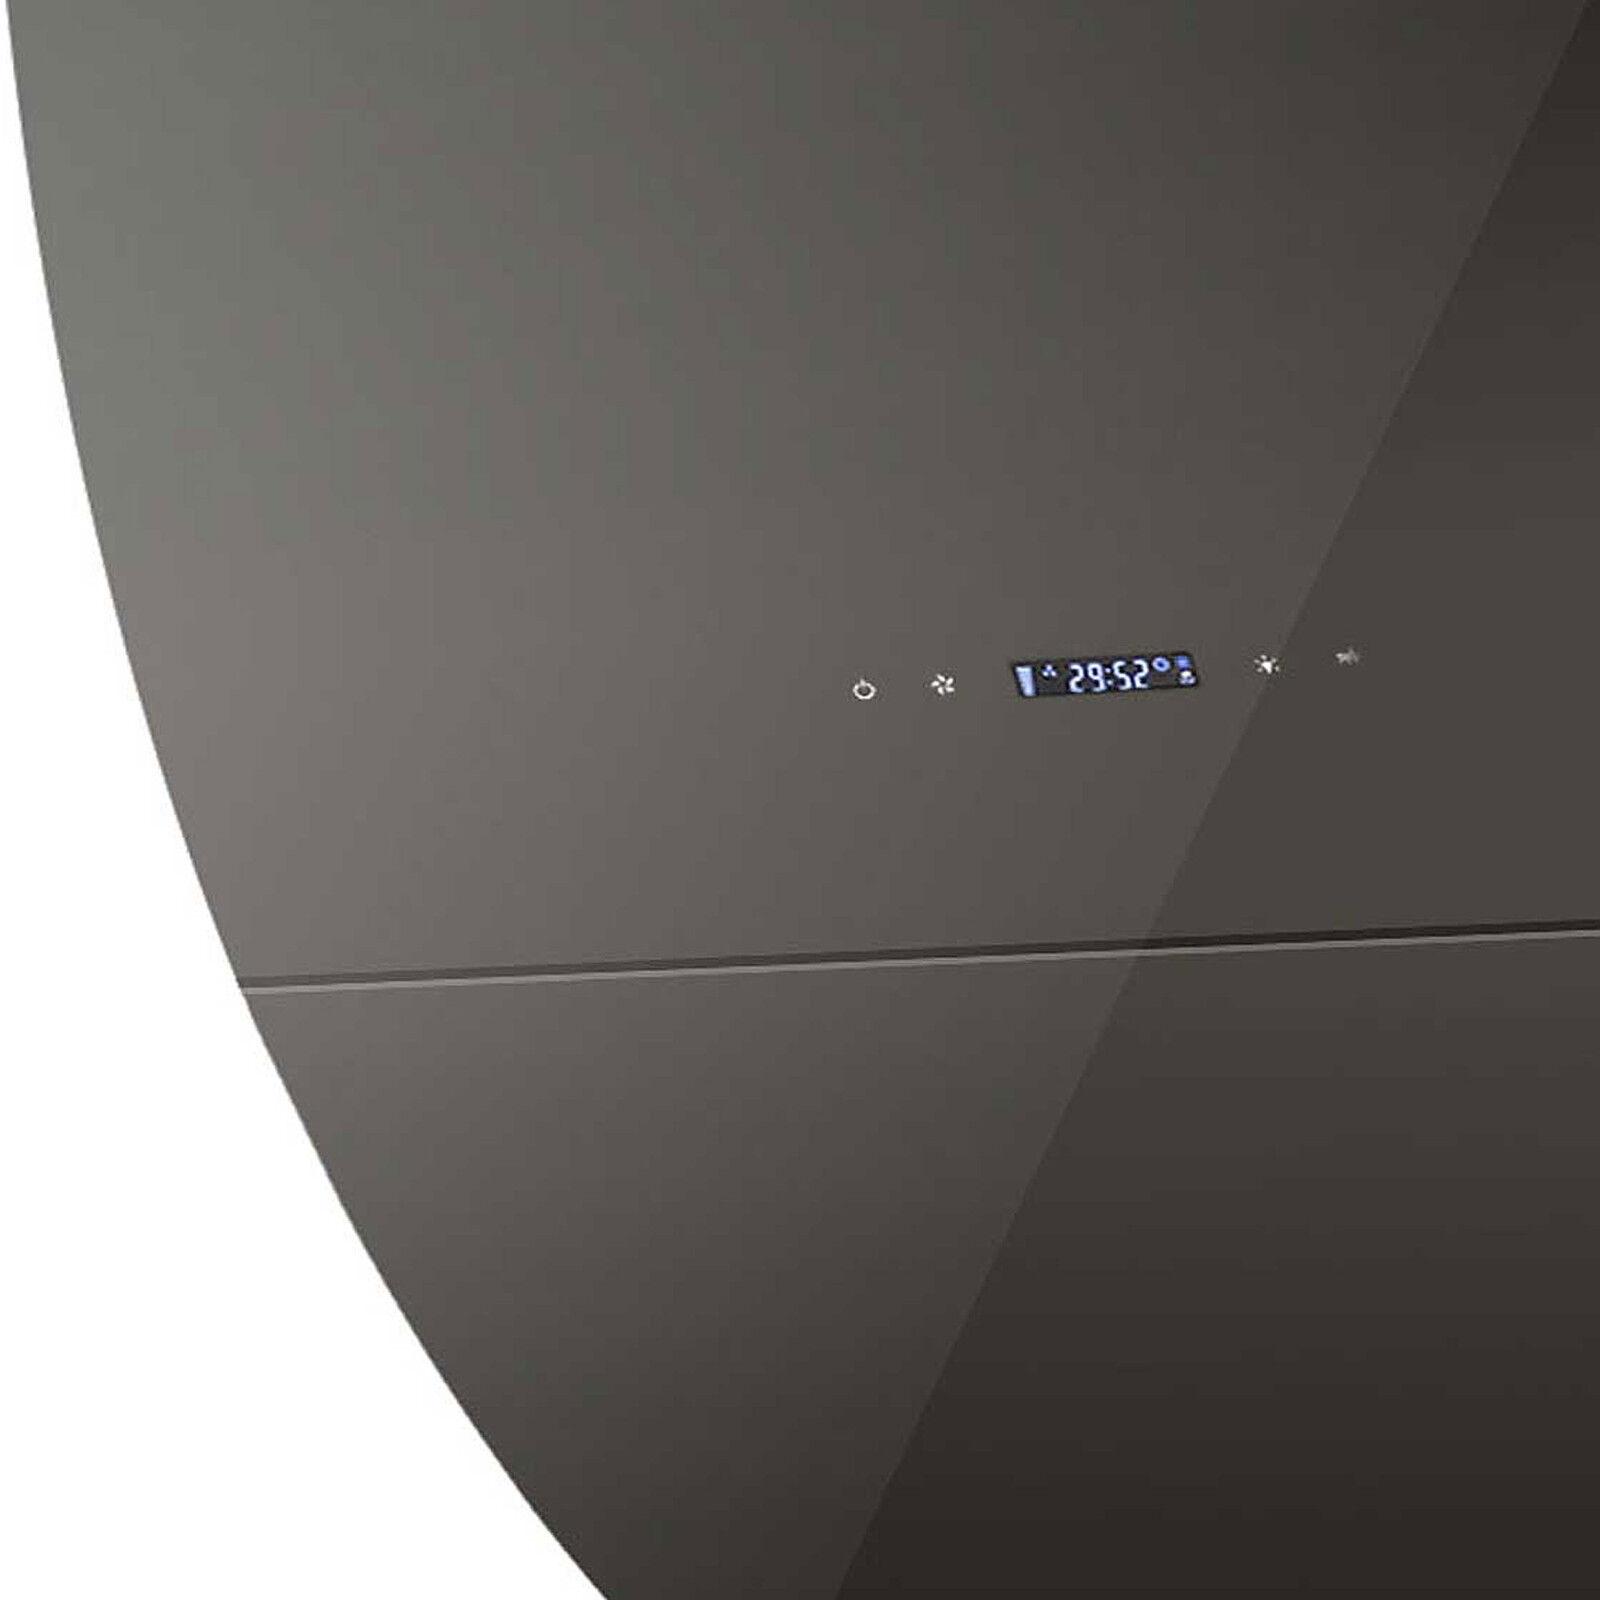 dunstabzugshaube abzugshaube glashaube wandhaube kopffreihaube 90 cm schwarz eur 229 90. Black Bedroom Furniture Sets. Home Design Ideas